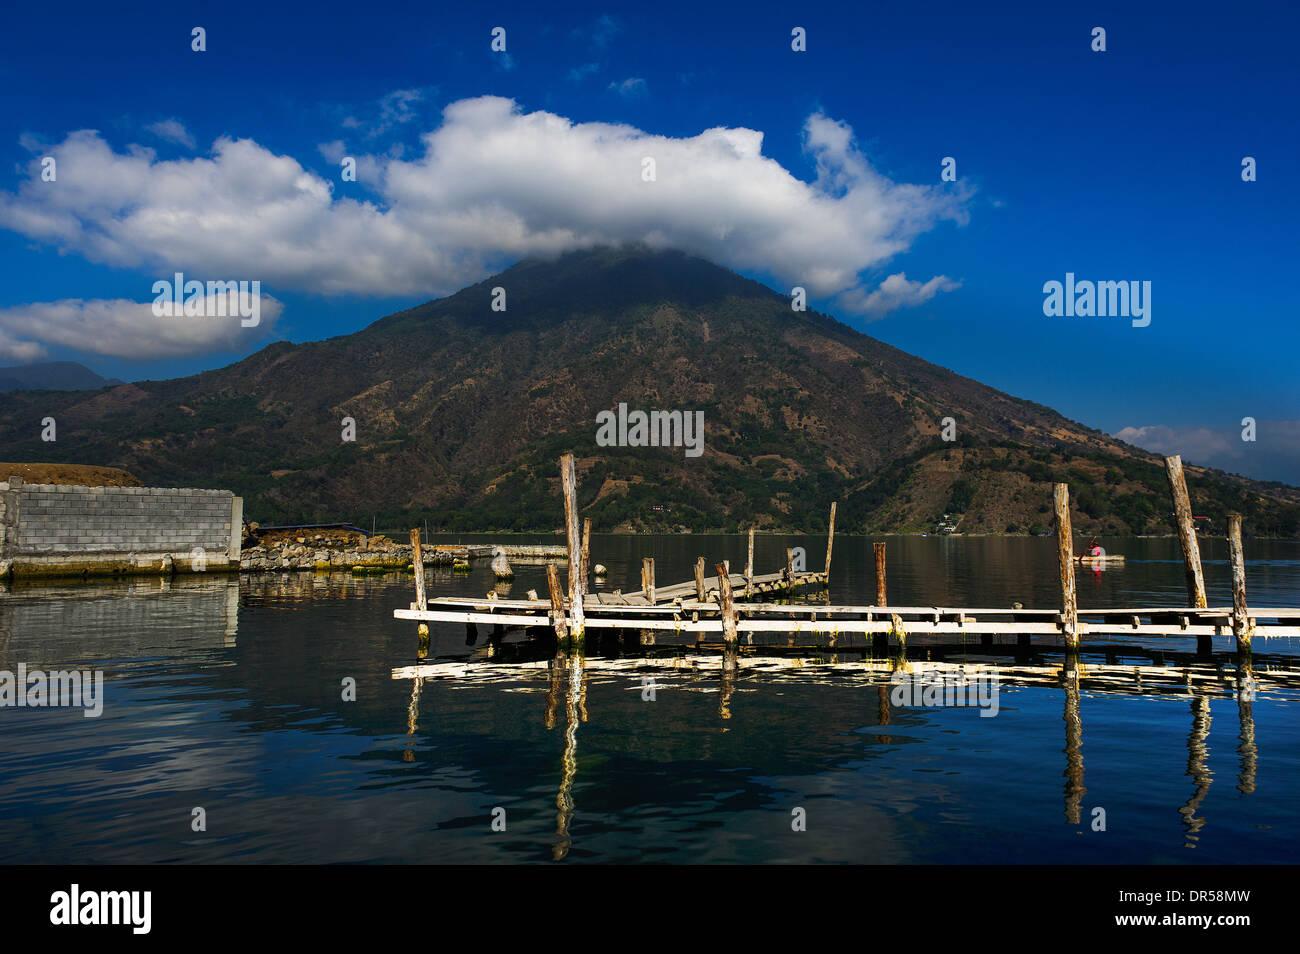 San Pedro volcano, Guatemala - Stock Image